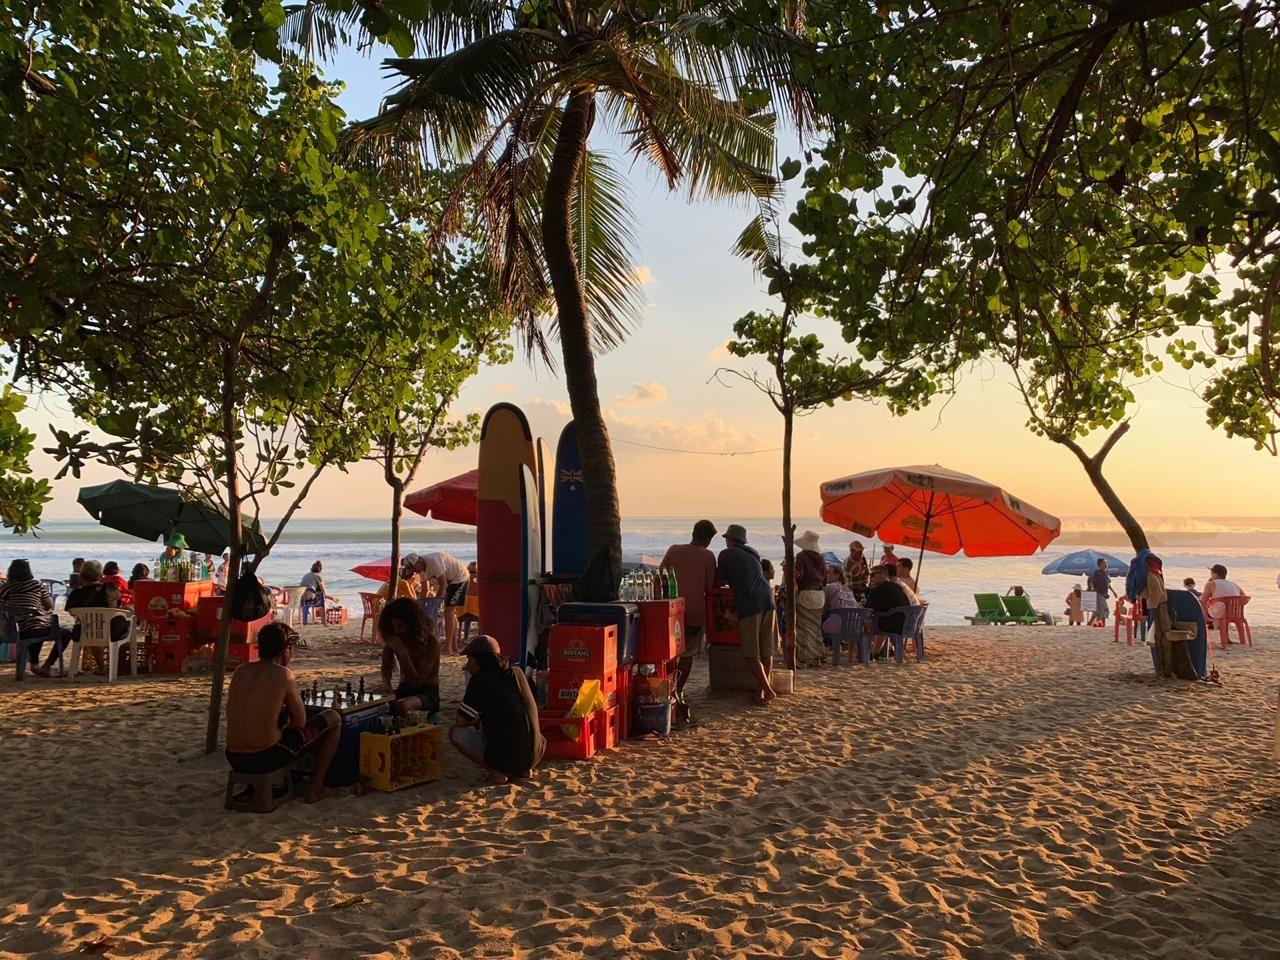 Photo of Bali By Nandini Mahadev